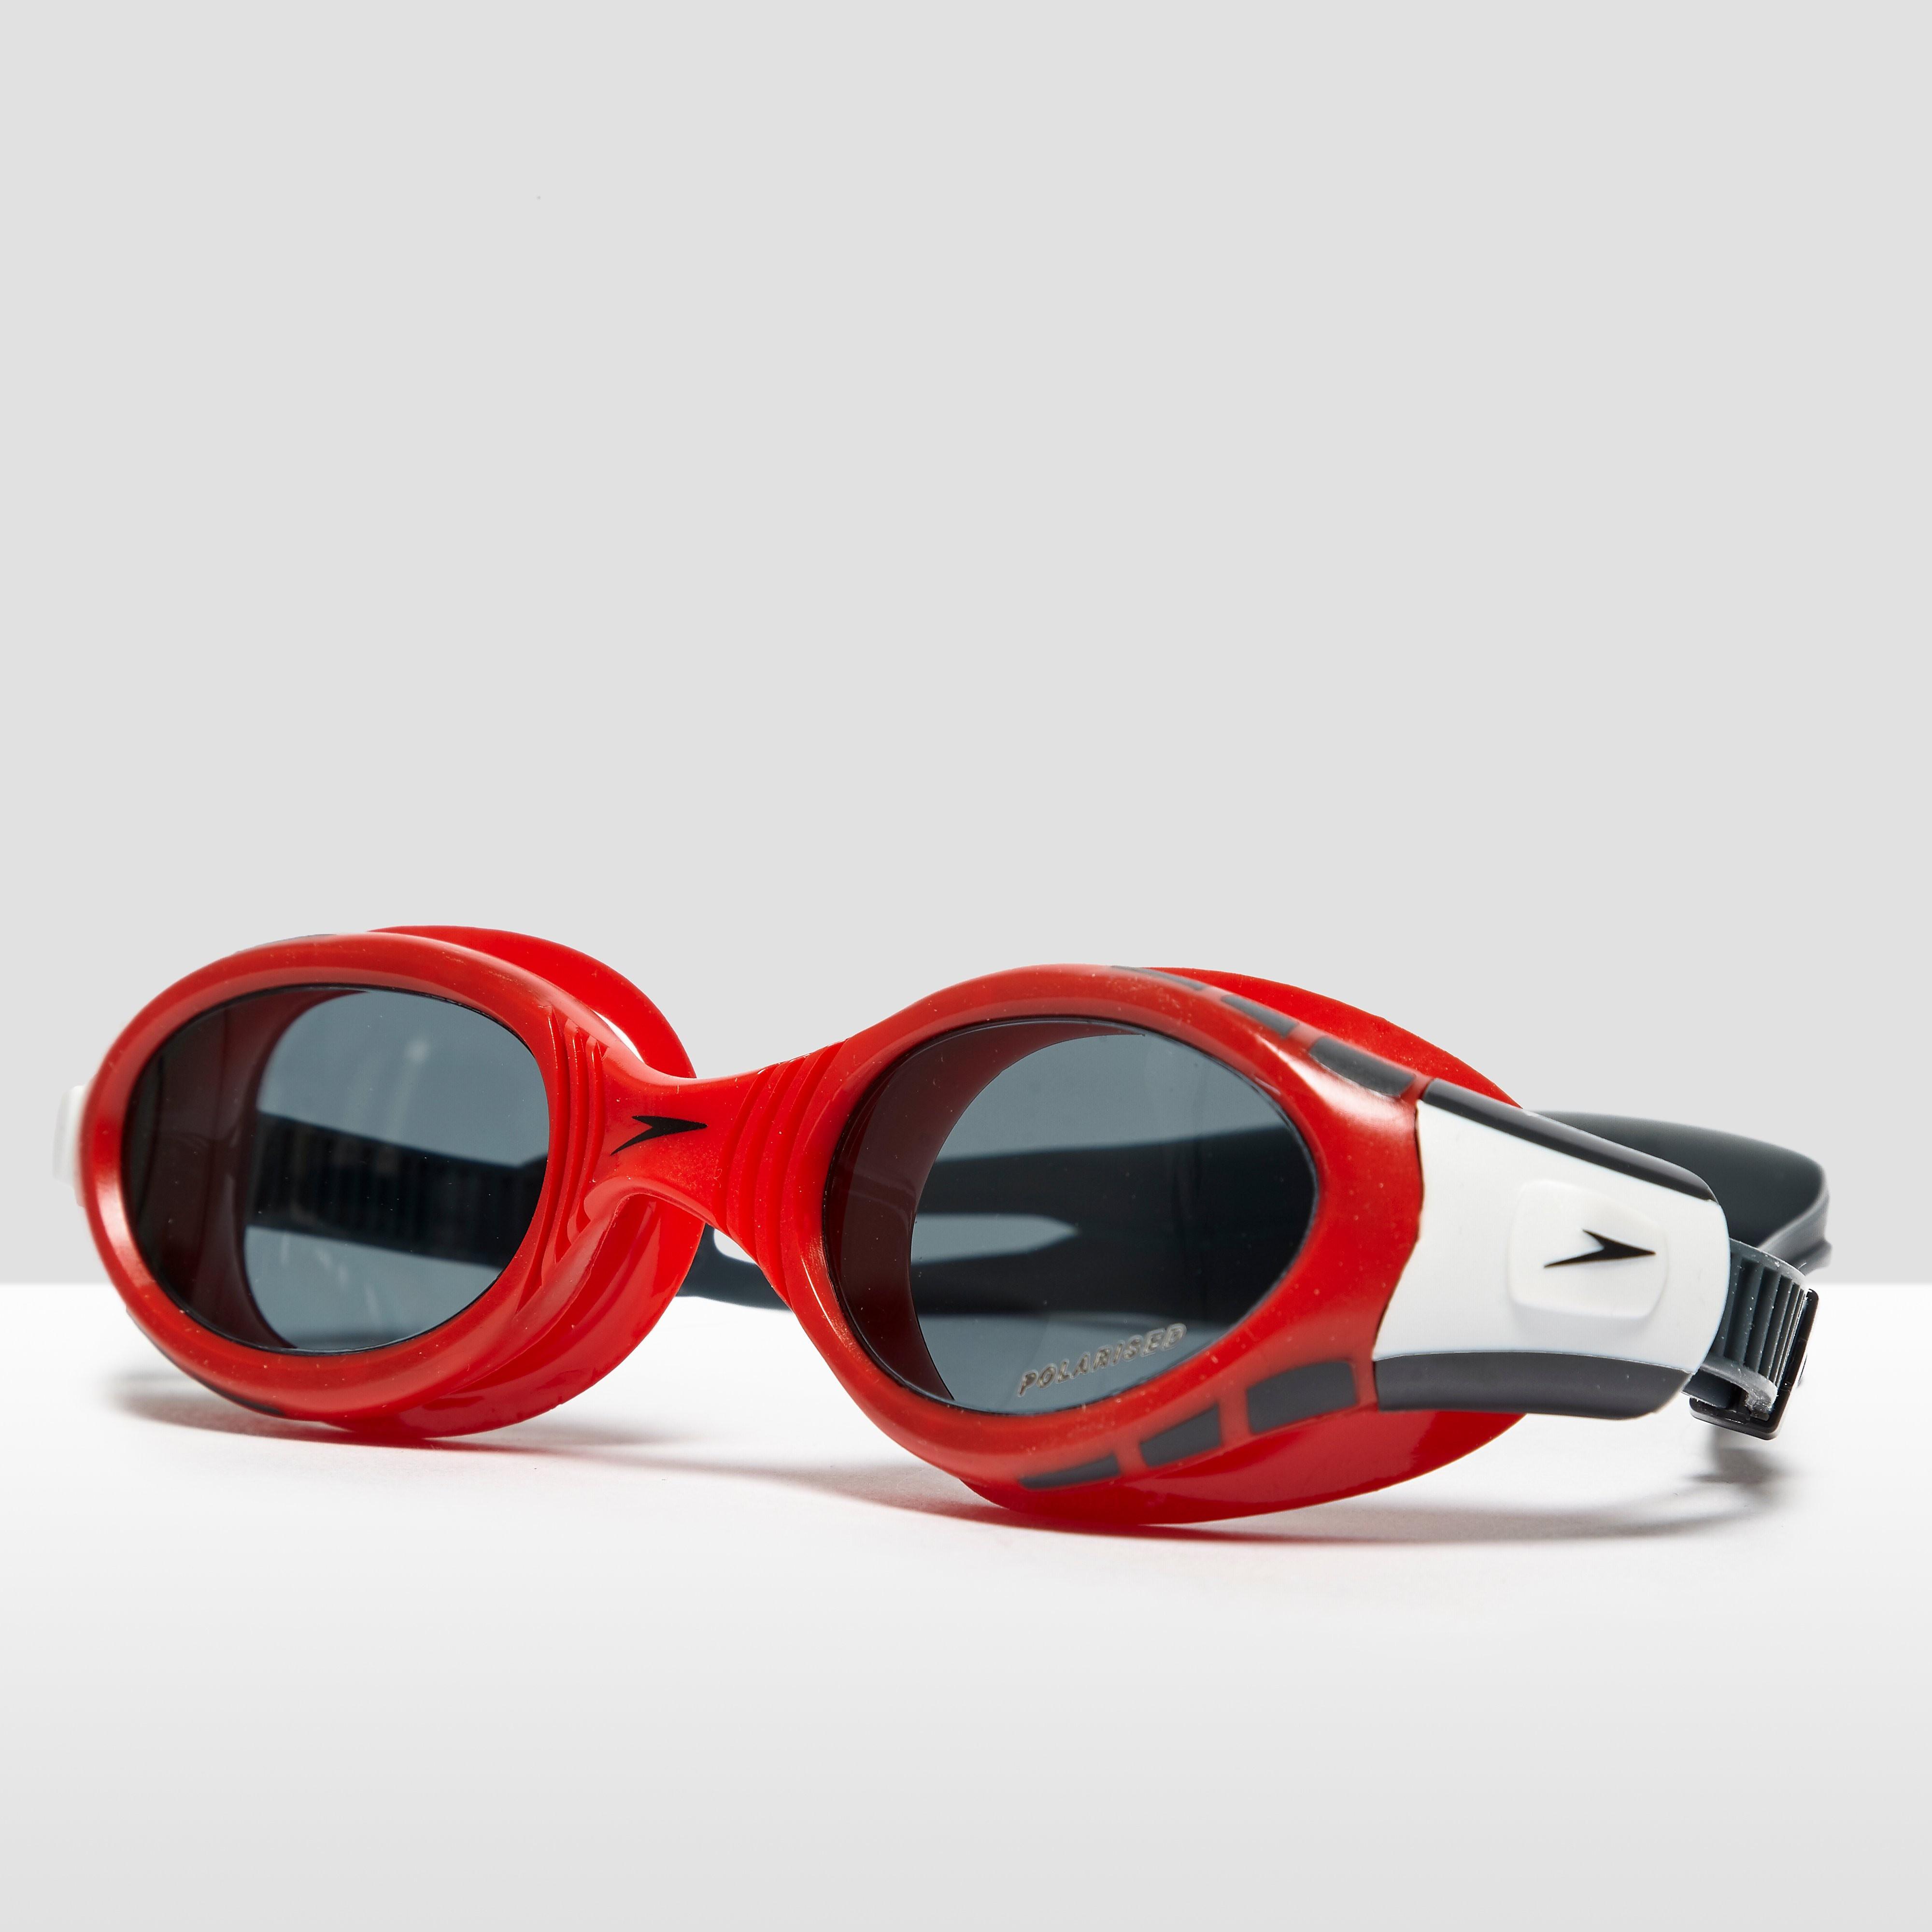 Speedo Futura Biofuse Polarised Swimming Goggles